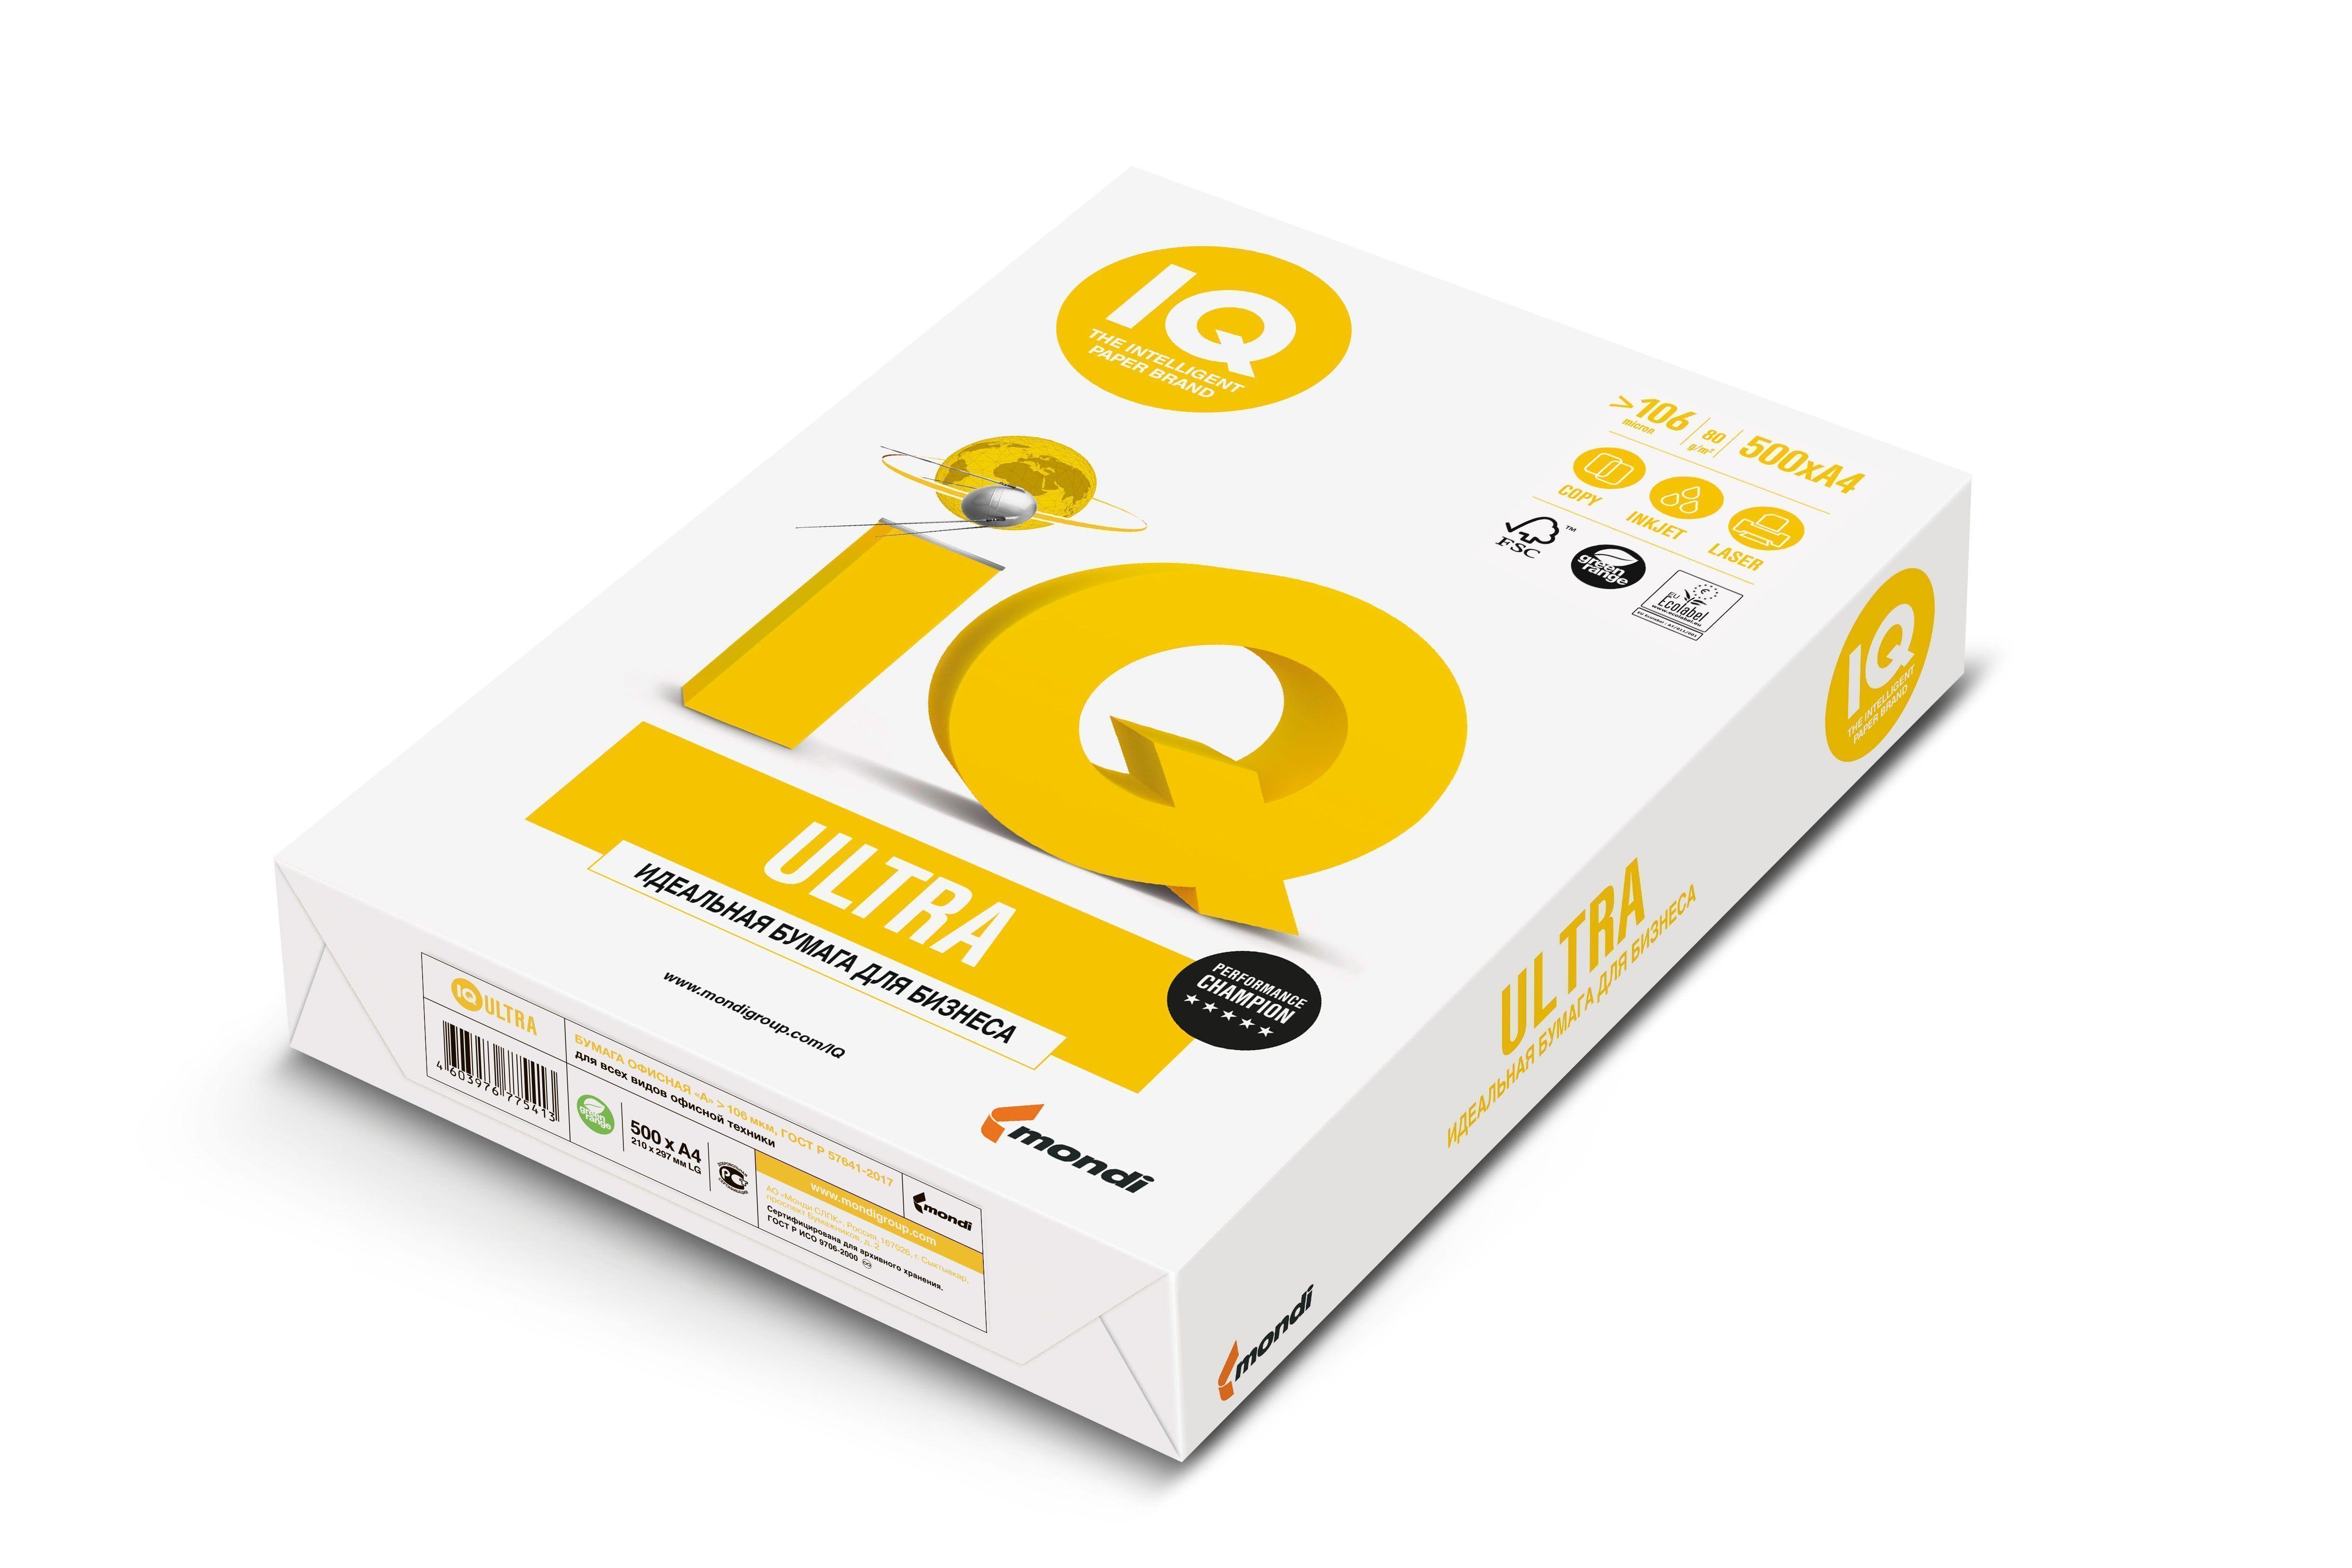 Бумага IQ ULTRA А4, 80 г/м2, 500 листов, 168% (CIE)